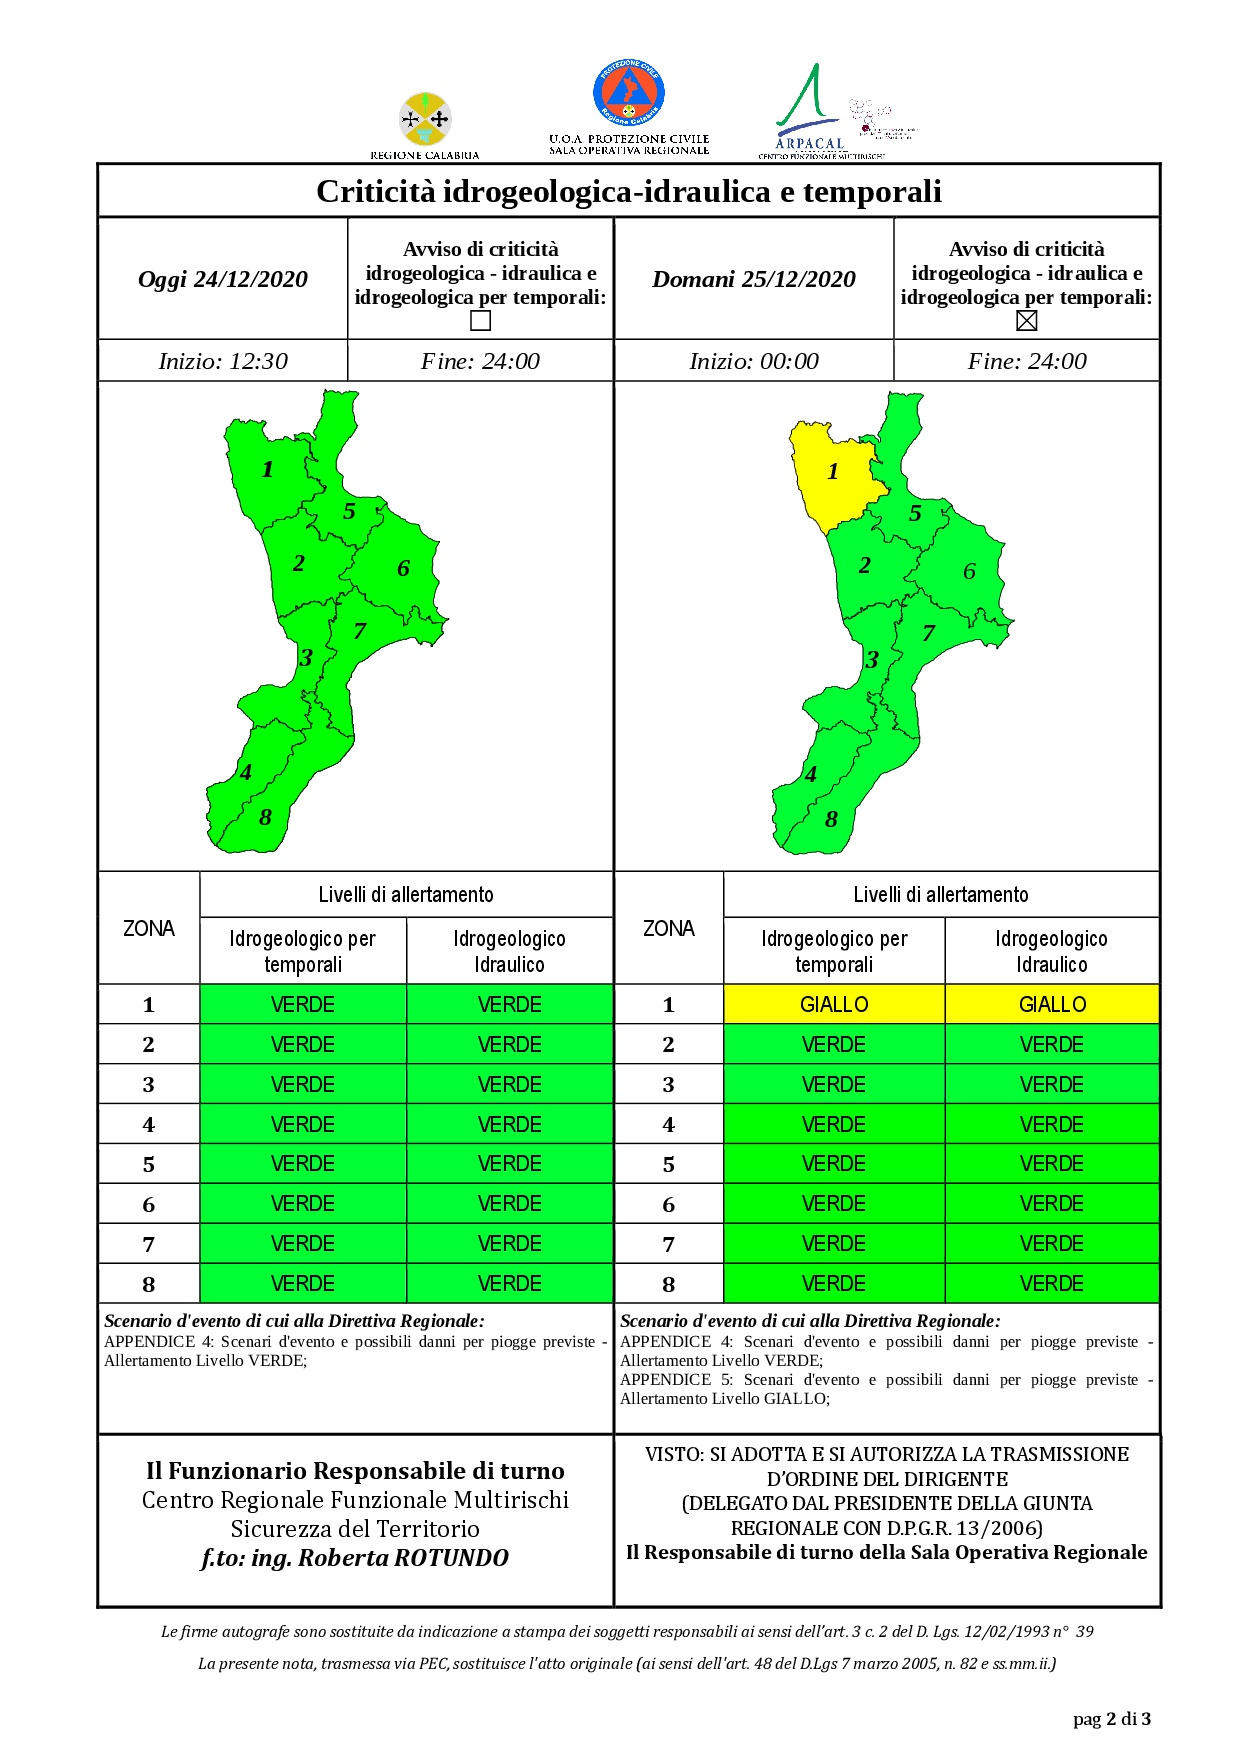 Criticità idrogeologica-idraulica e temporali in Calabria 24-12-2020